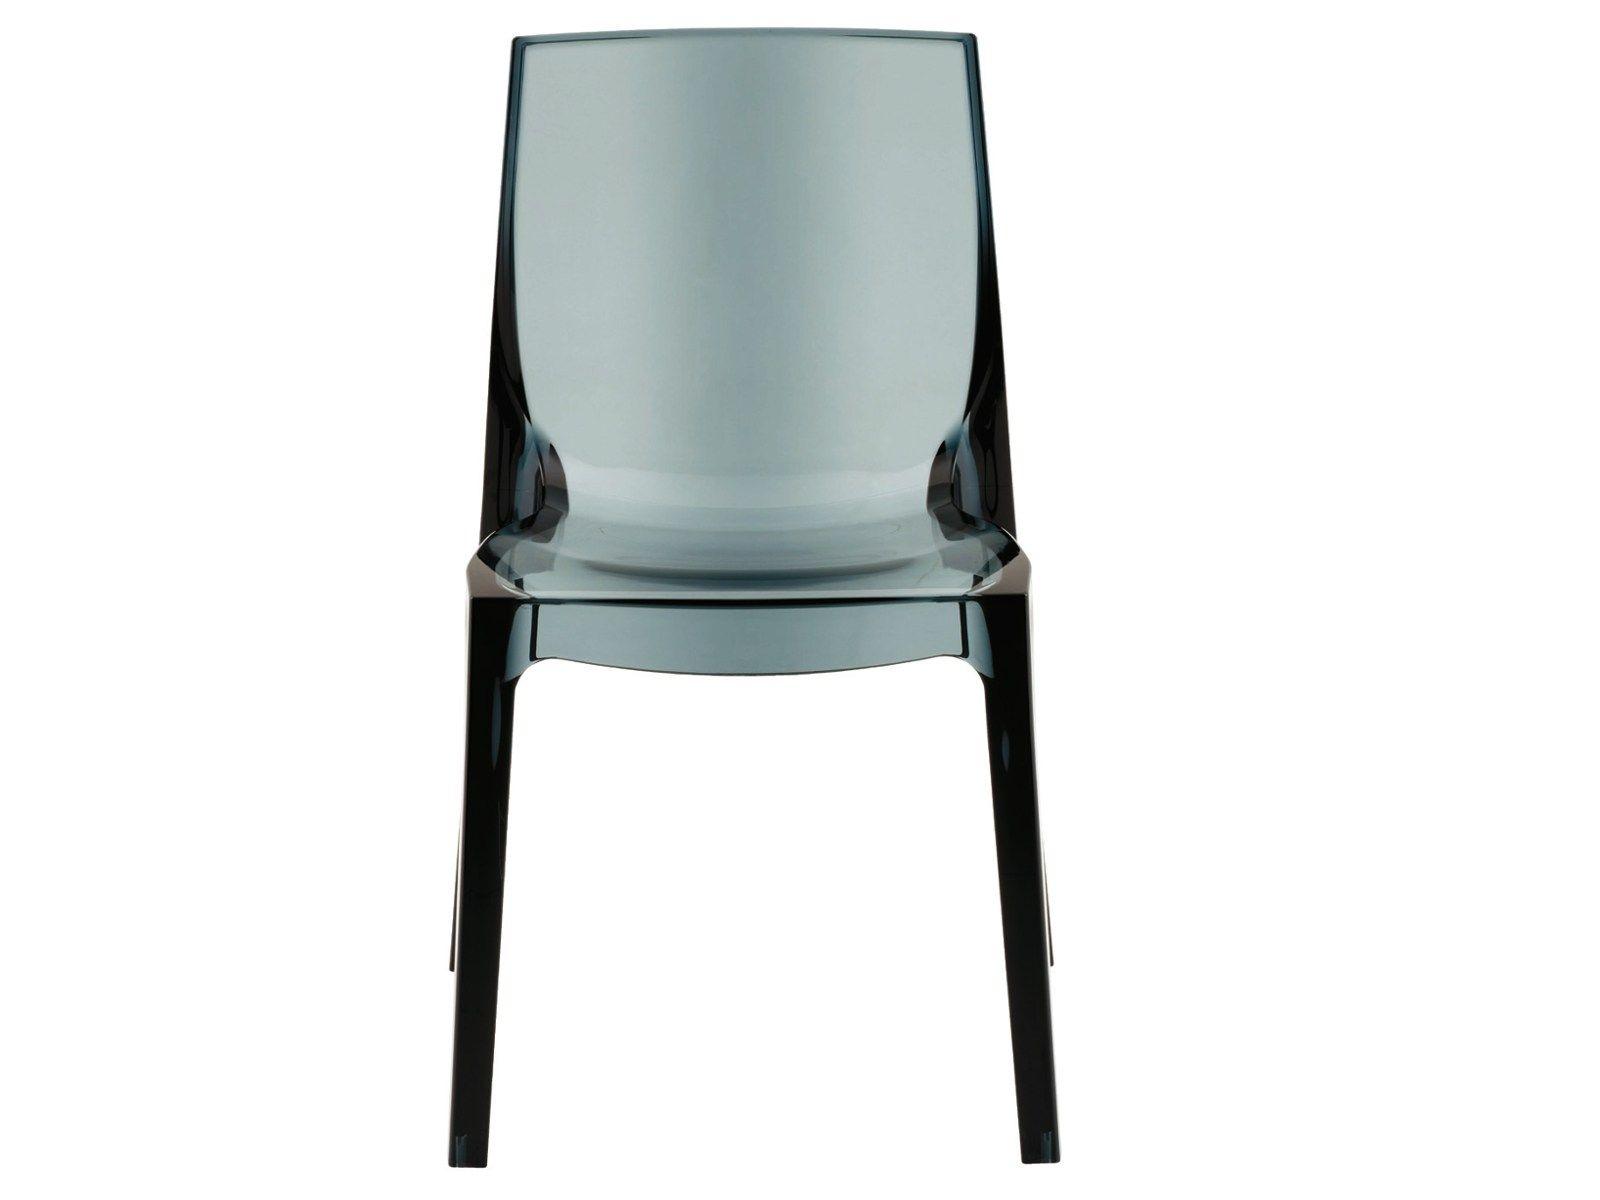 Marilyn chaise en polycarbonate by vela arredamenti design studio progettazio - Chaise en polycarbonate ...